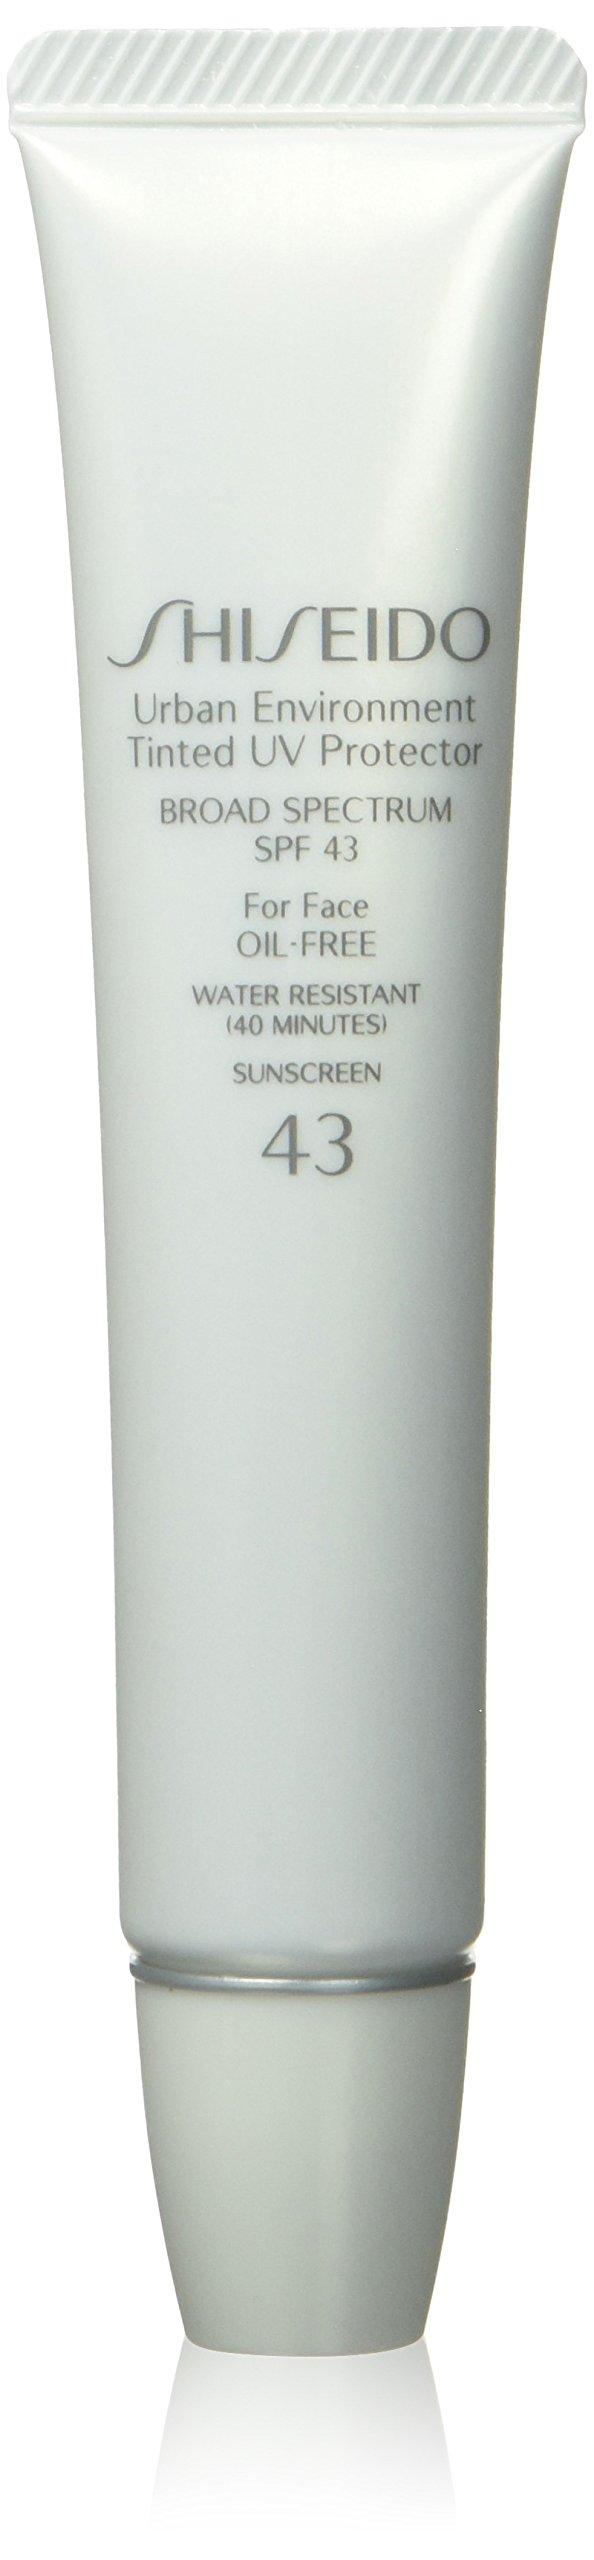 Shiseido Urban Environment Tinted UV Protector Broad Spectrum SPF 43, No. 3 for Face, 1.10 Ounce by Shiseido